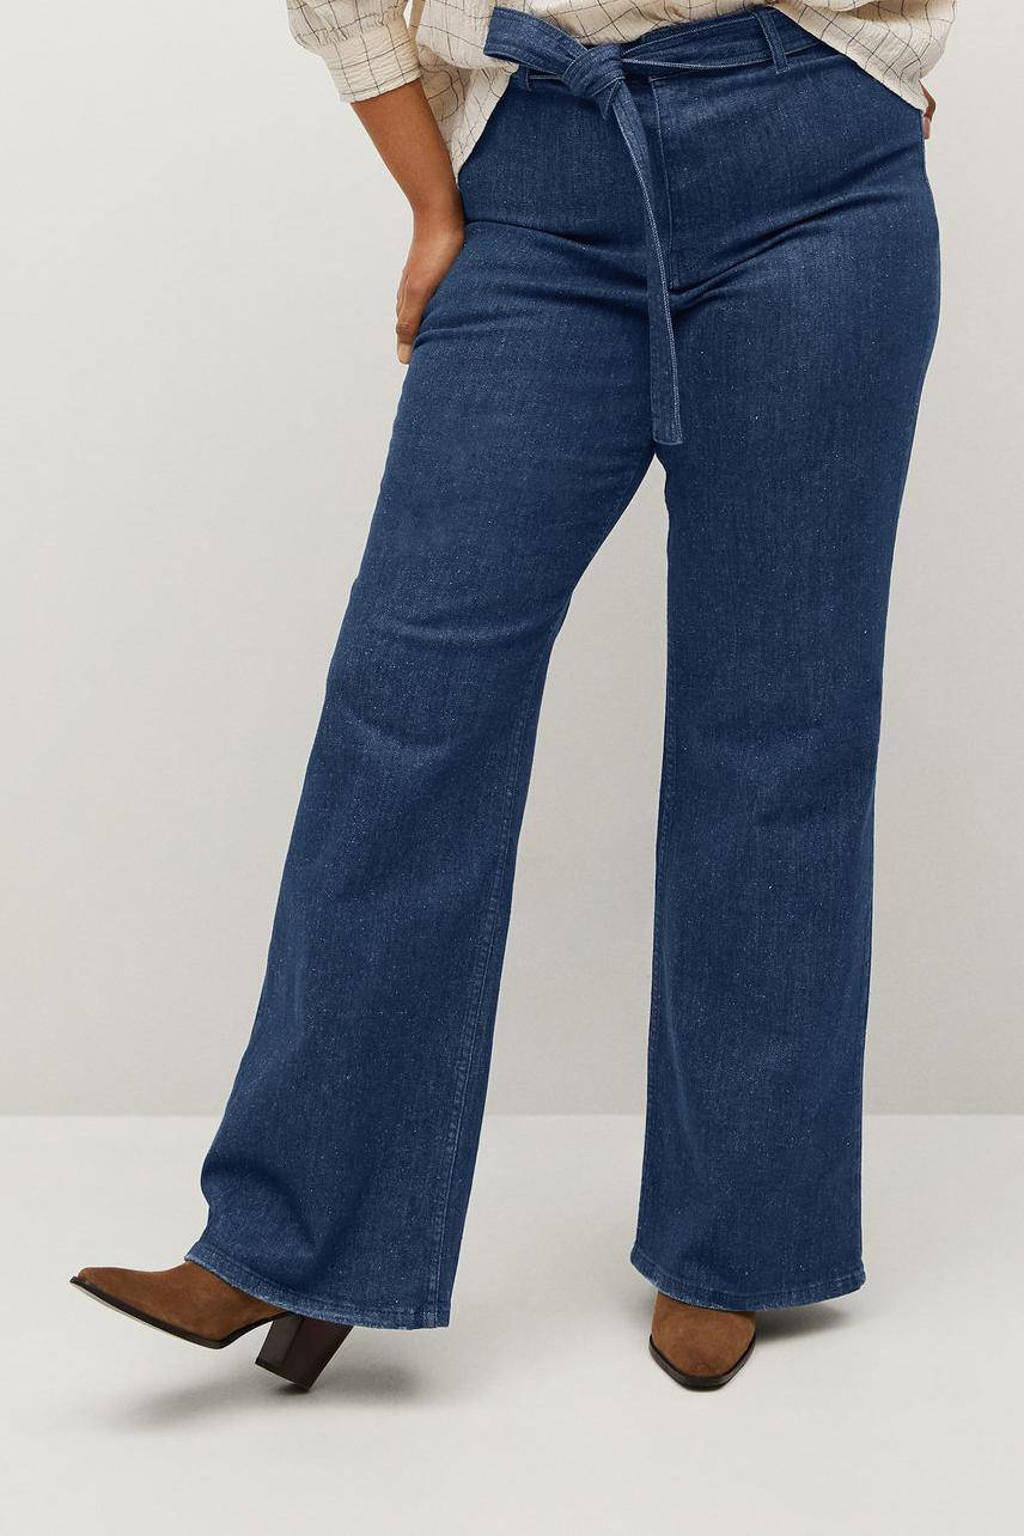 Violeta by Mango high waist loose fit jeans blue